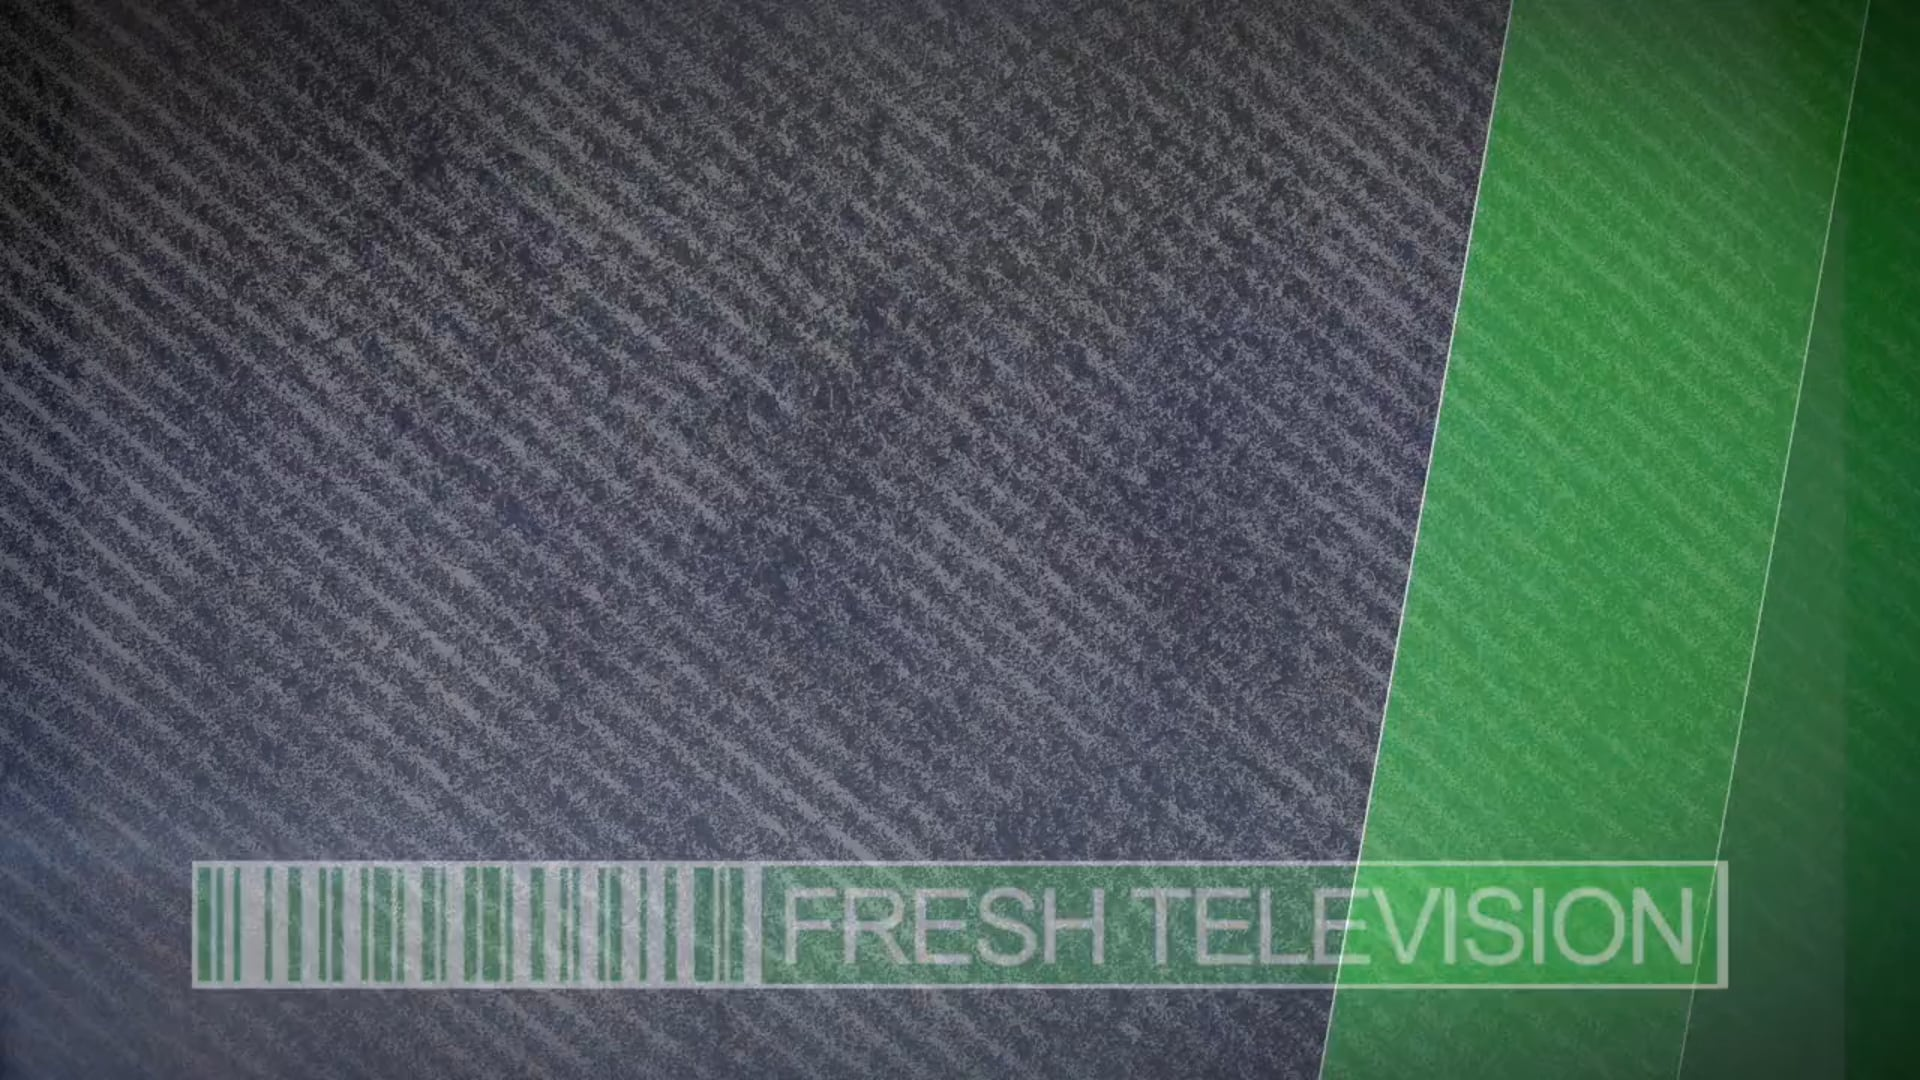 Fresh Television